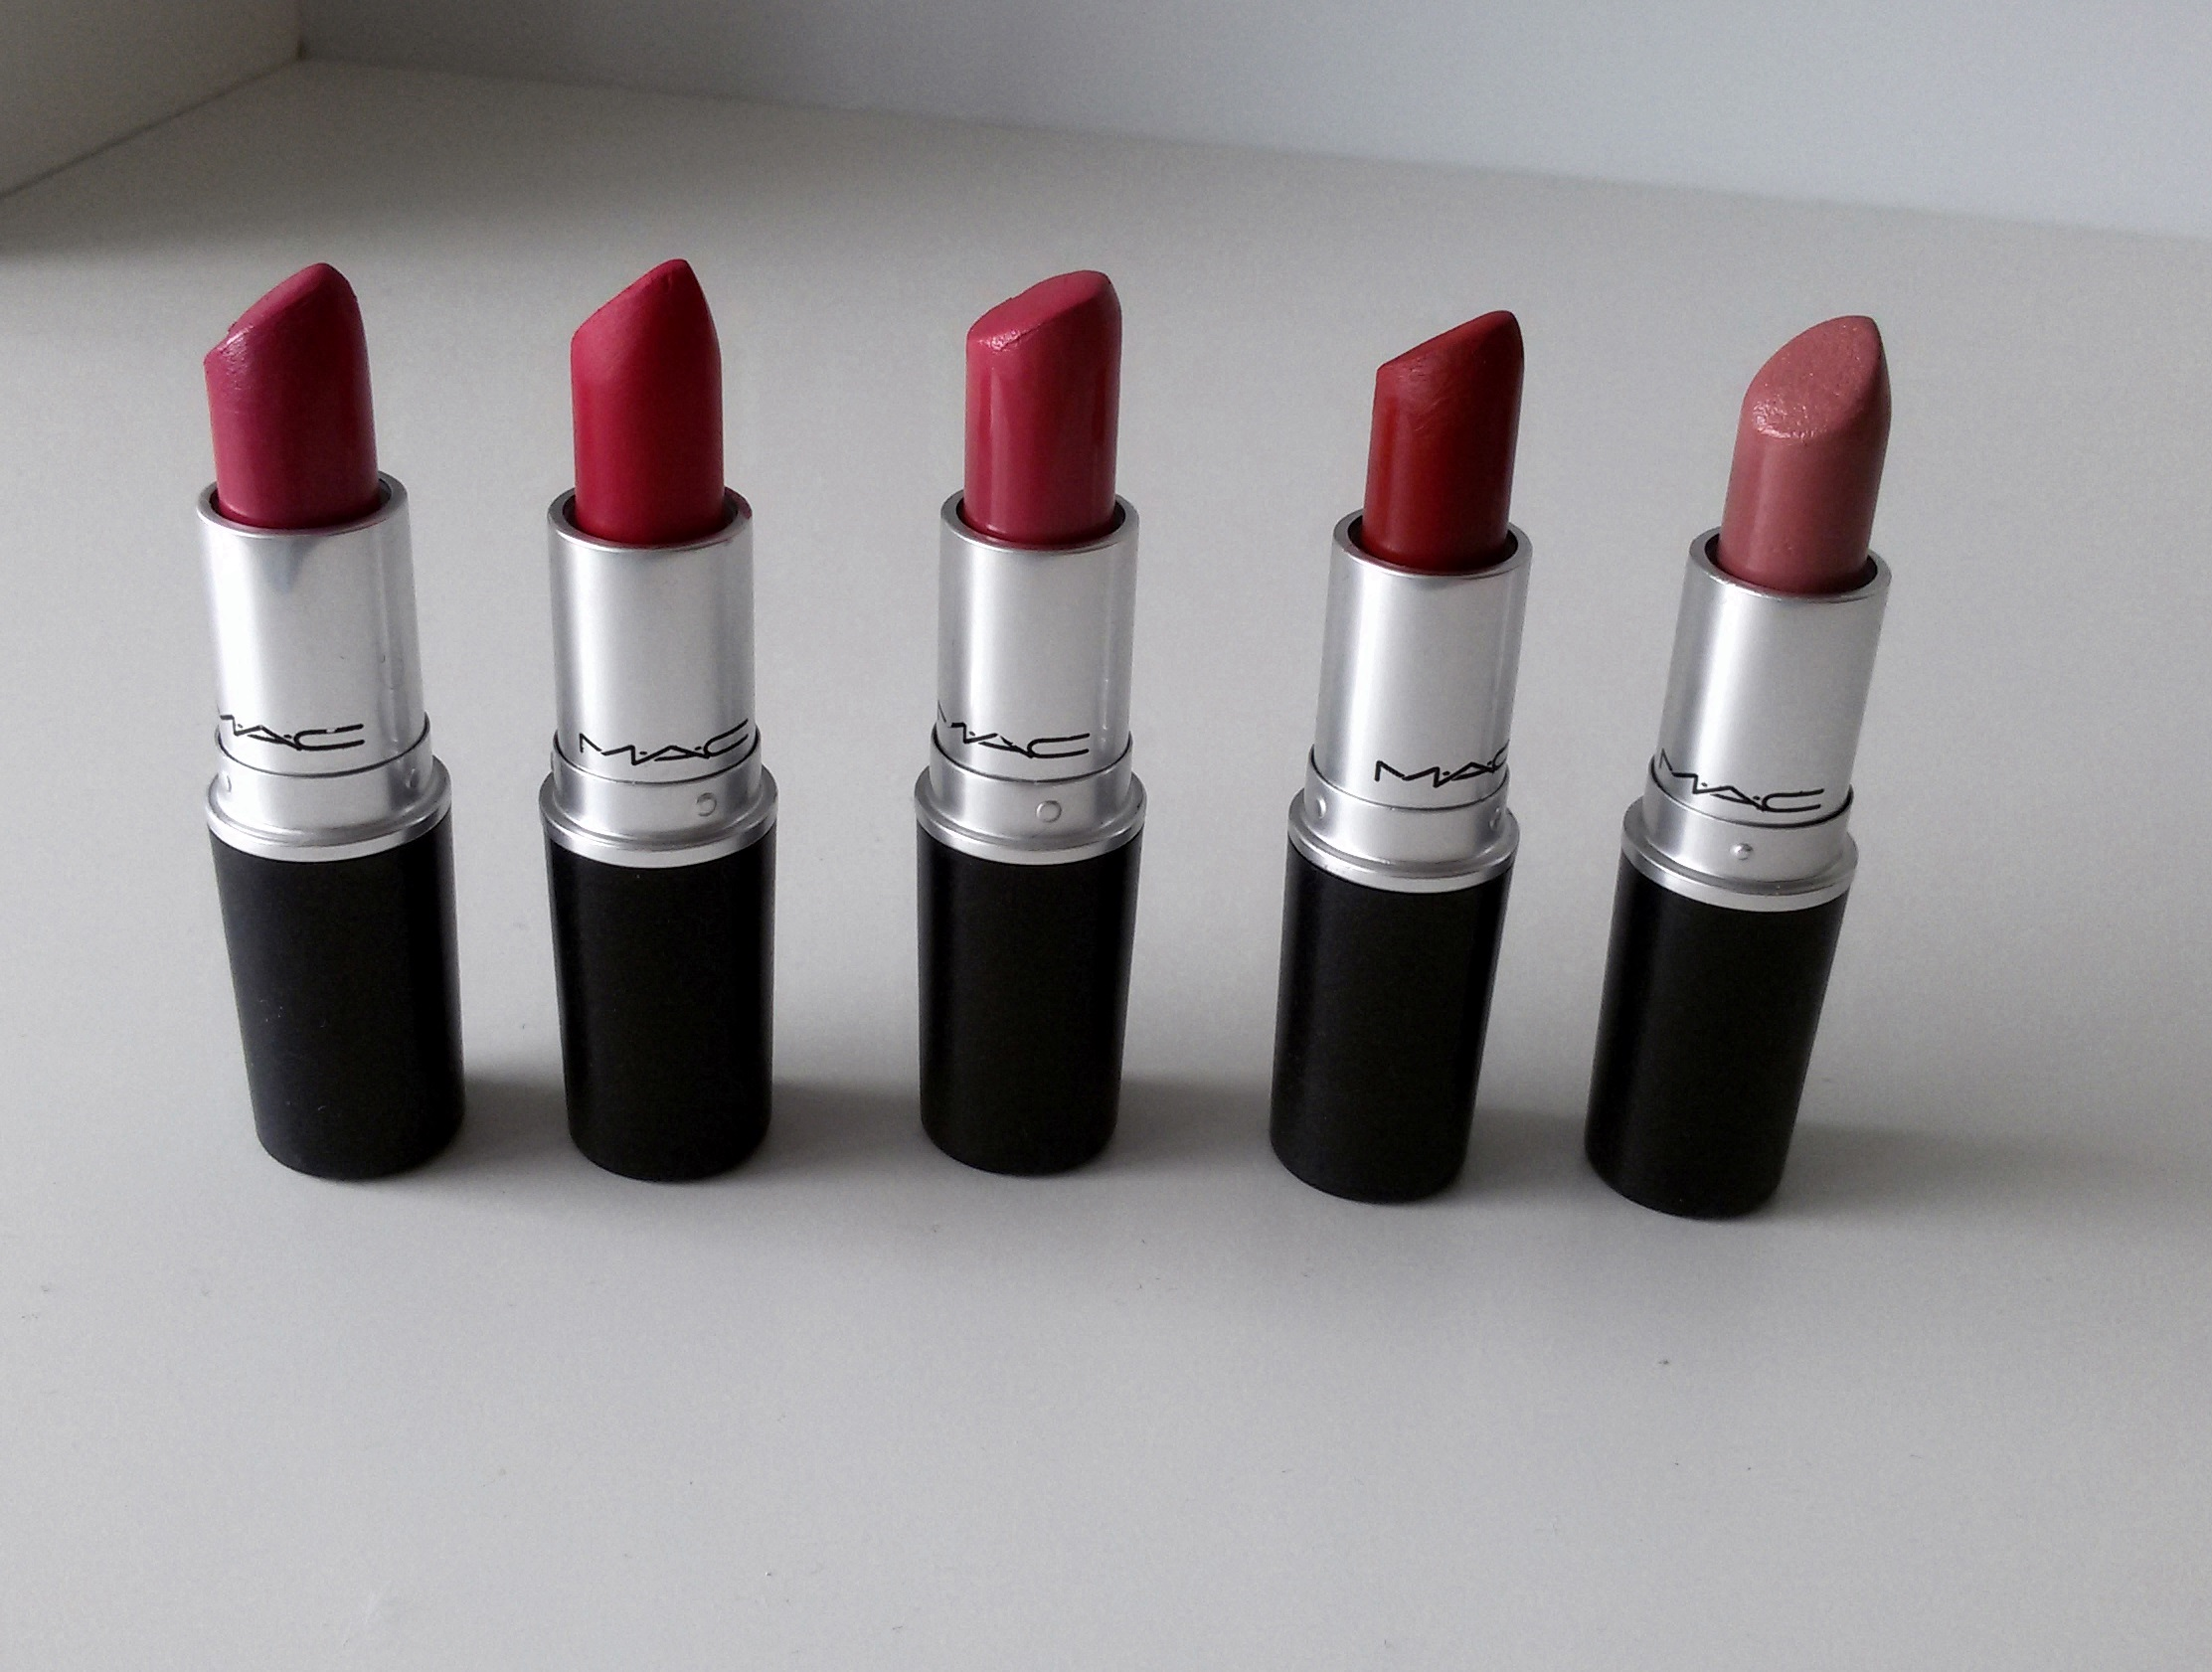 Genoeg Mijn Mac lipsticks - Cozy Me &MH13